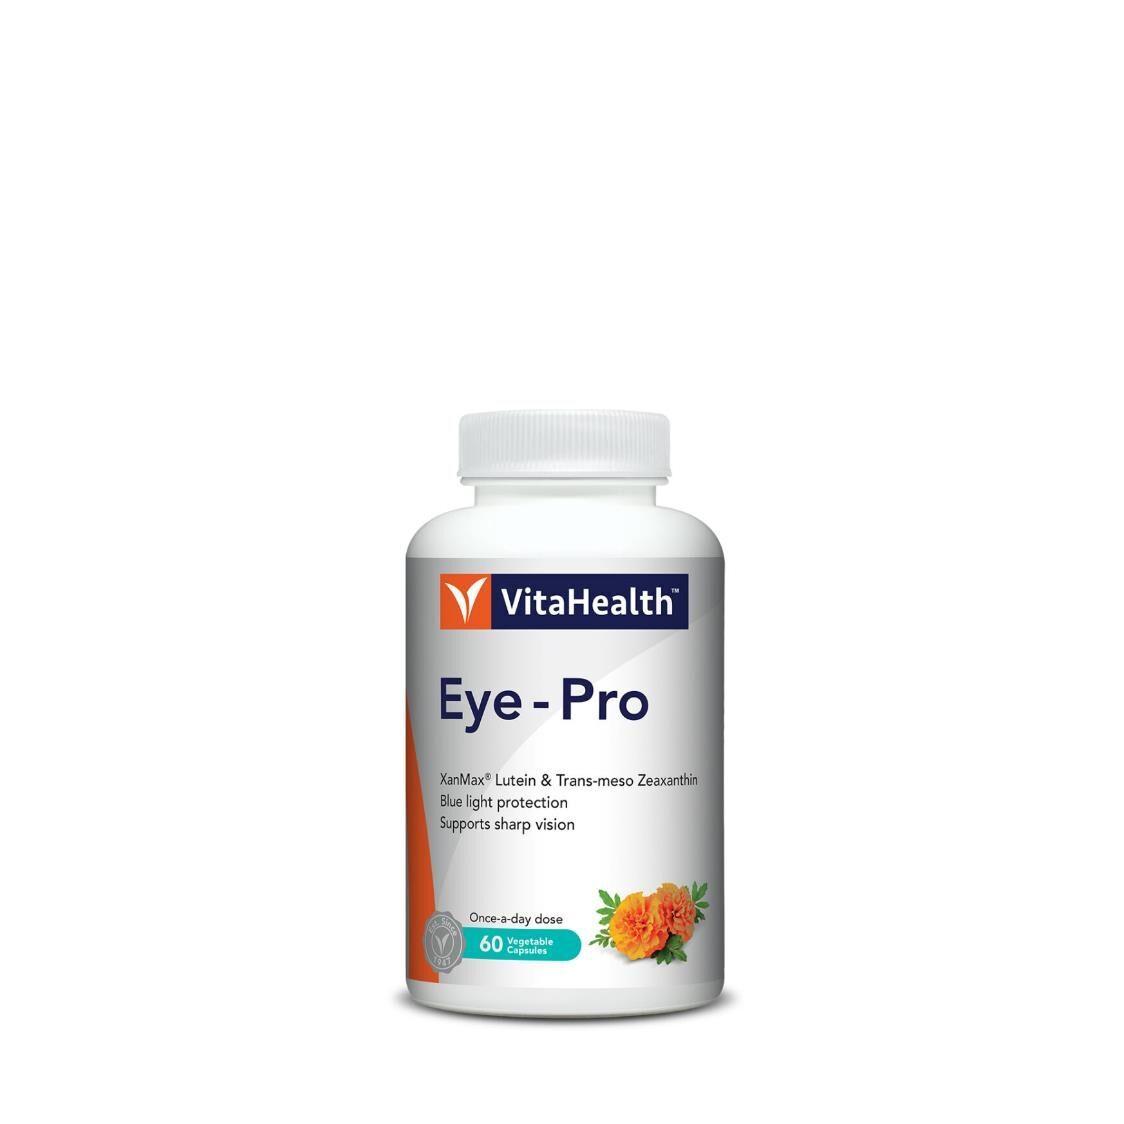 VitaHealth Eye-Pro 60s